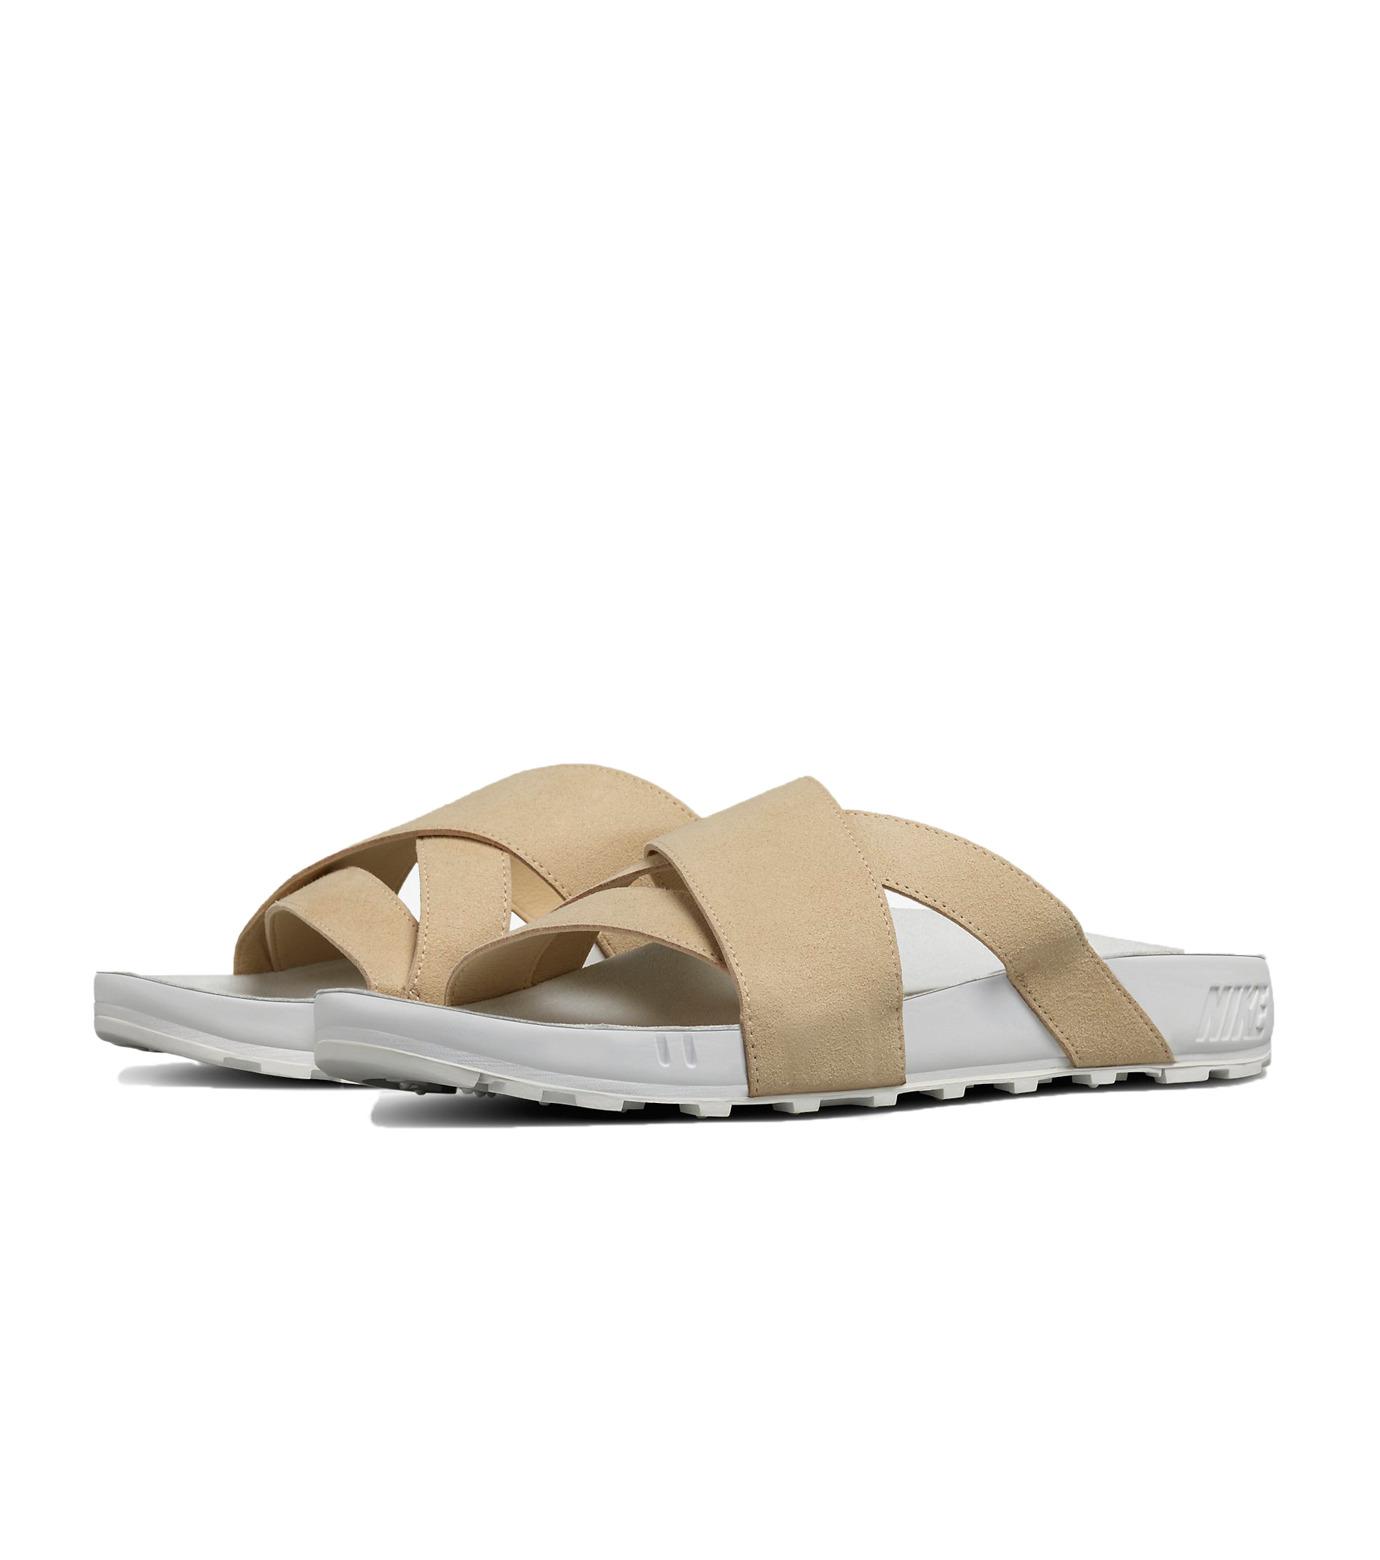 NIKE(ナイキ)のTAUPO-BEIGE(シューズ/shoes)-849756-210-52 拡大詳細画像3